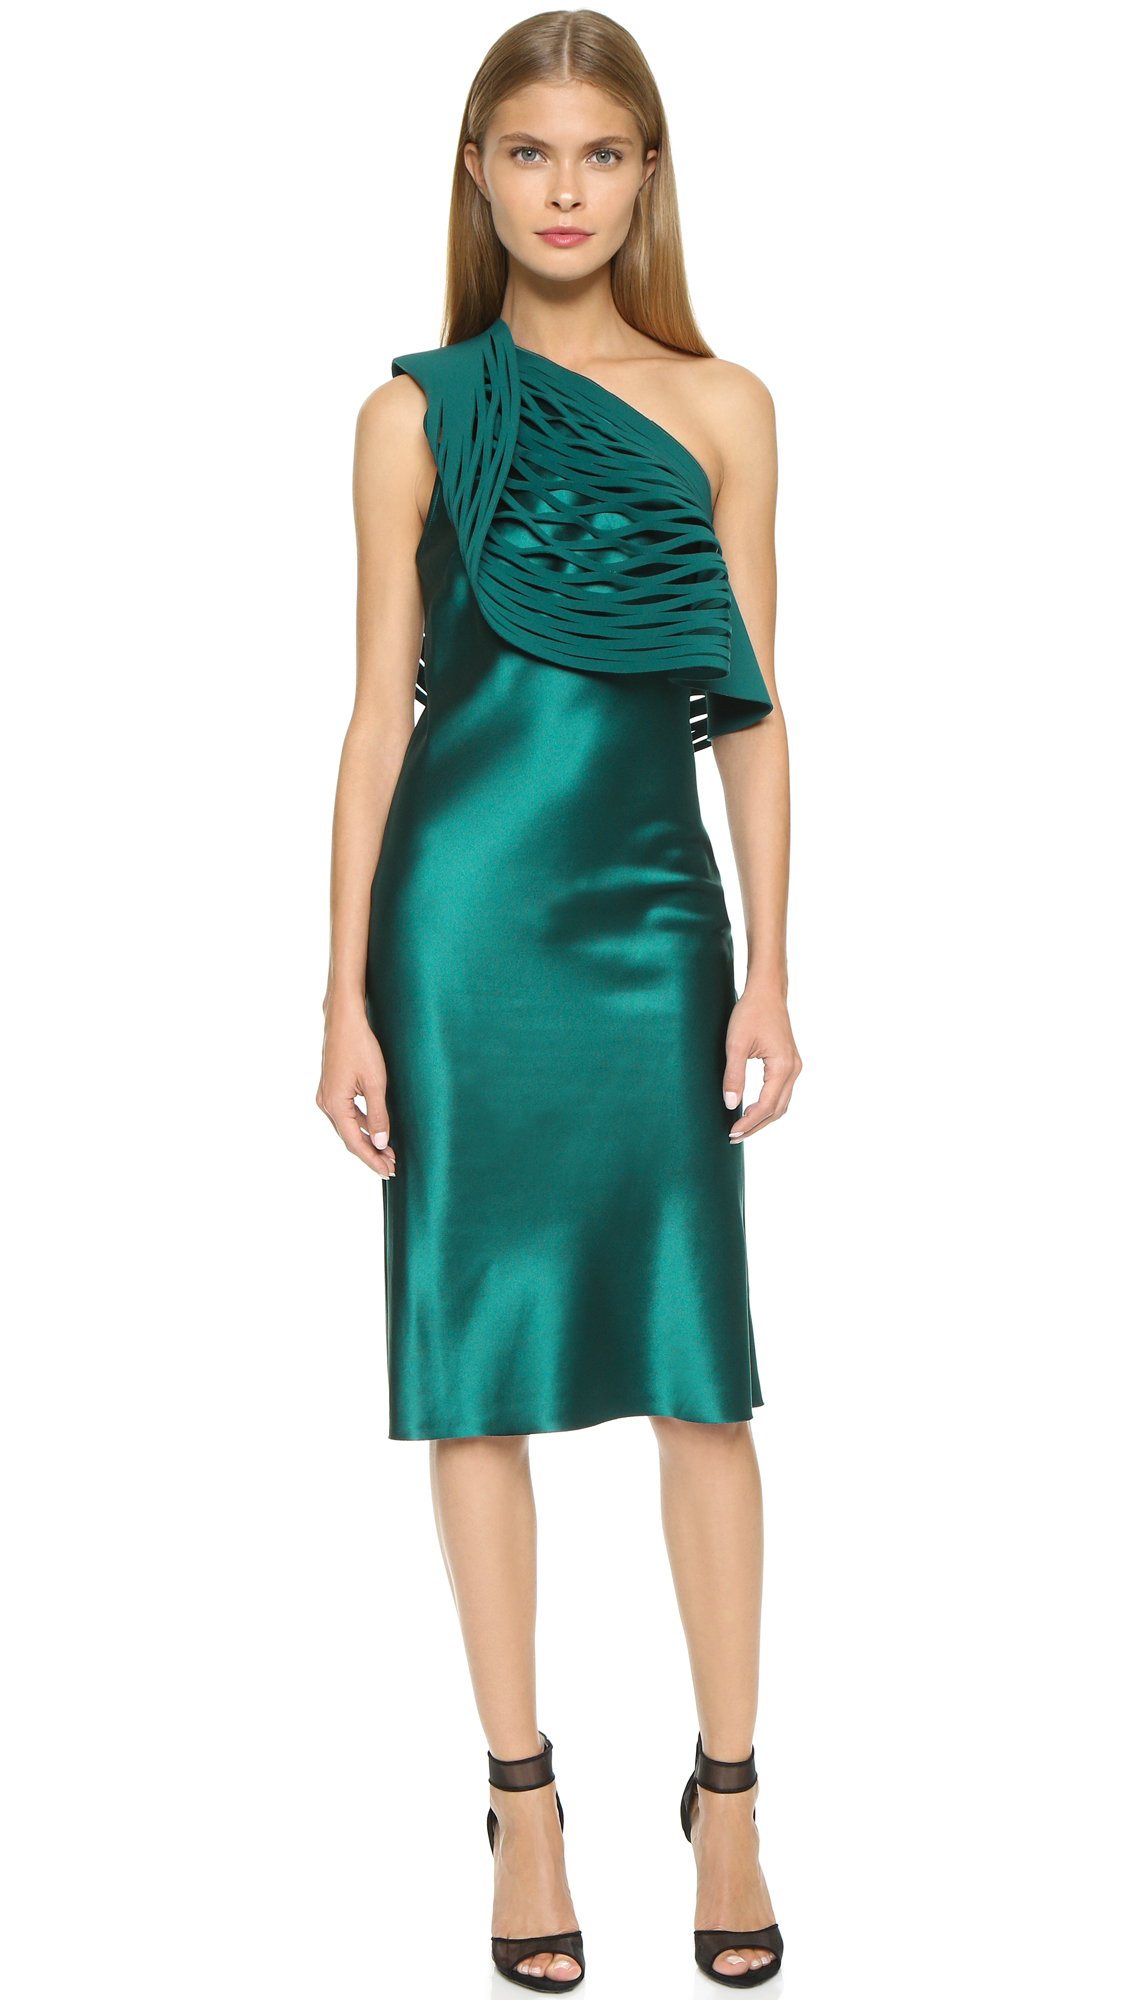 Lyst - Dion Lee Circle Cut Slip Dress - Emerald in Green